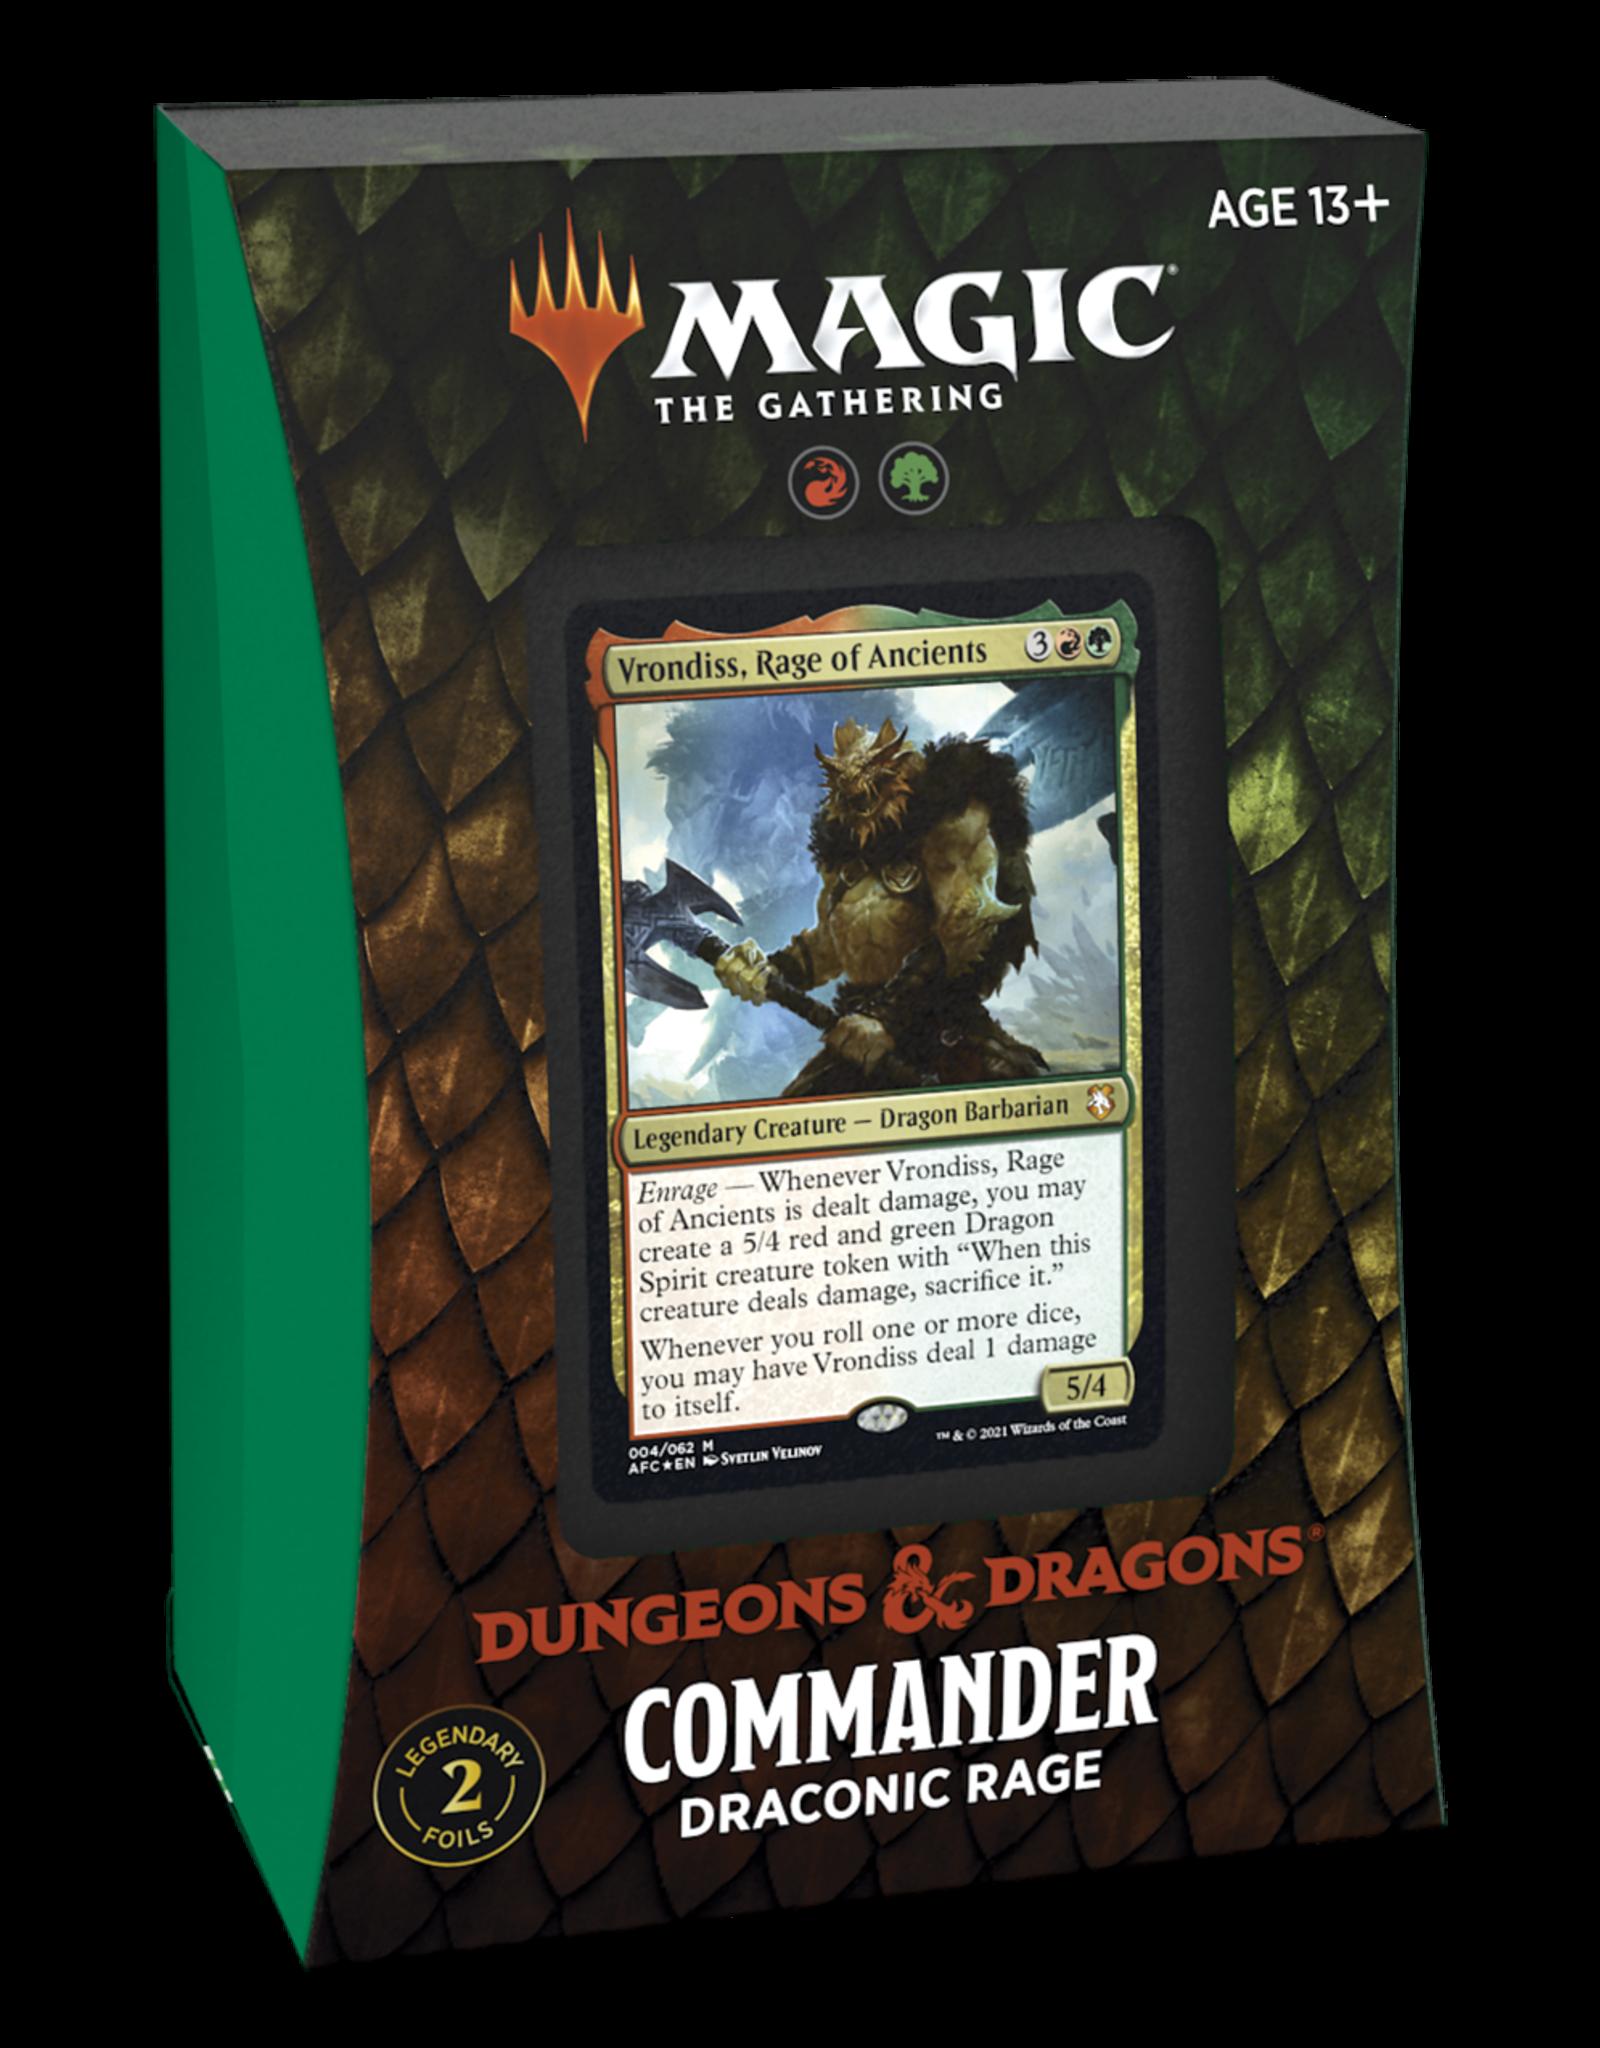 Adventures in the Forgotten Realms (AFR) Commander Deck - Draconic Rage (GR)